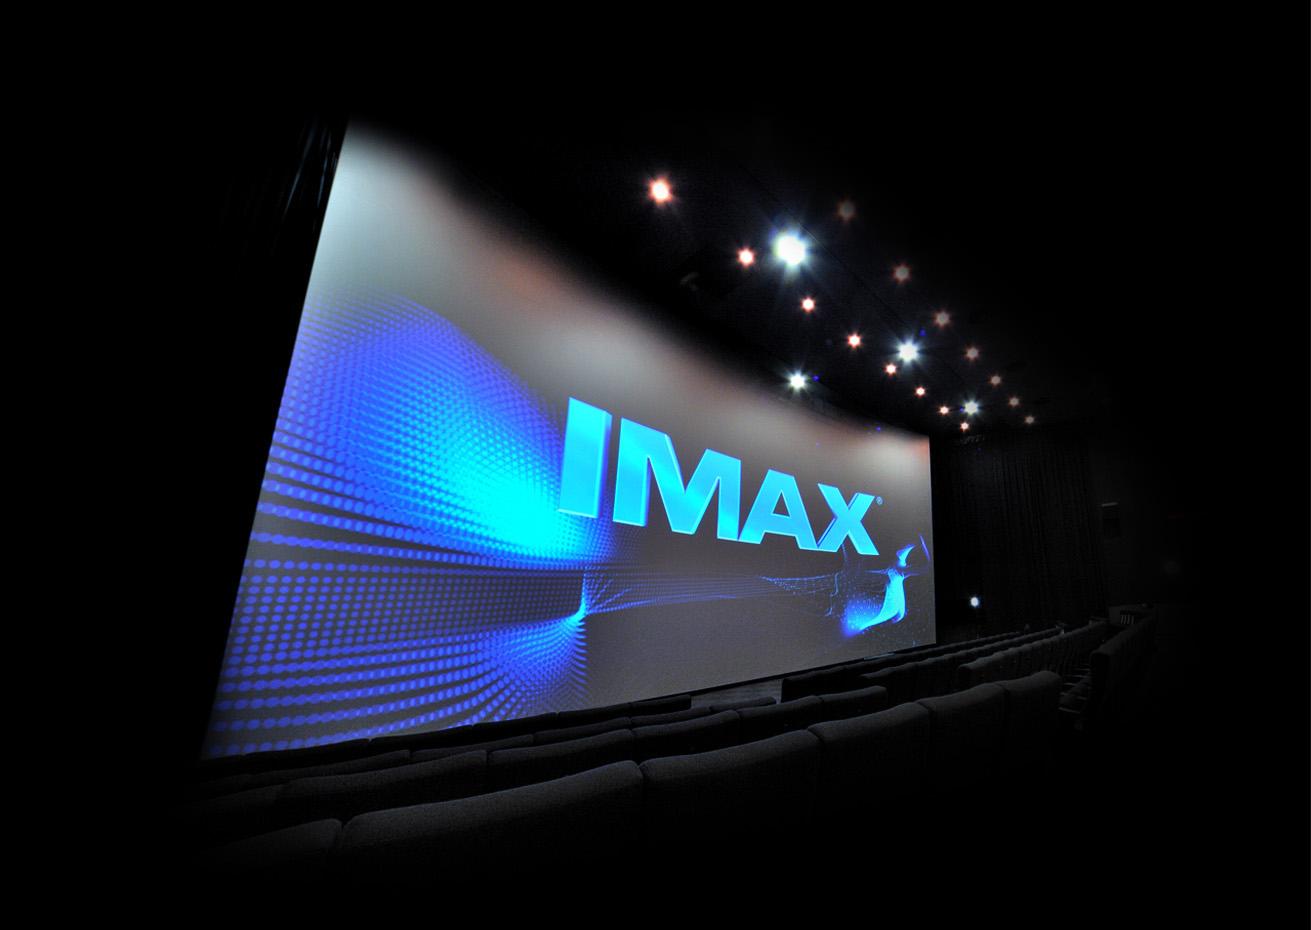 http://109cinemas.net/img/theatres/establishment/imax_109kawasaki_screen7_left.jpg